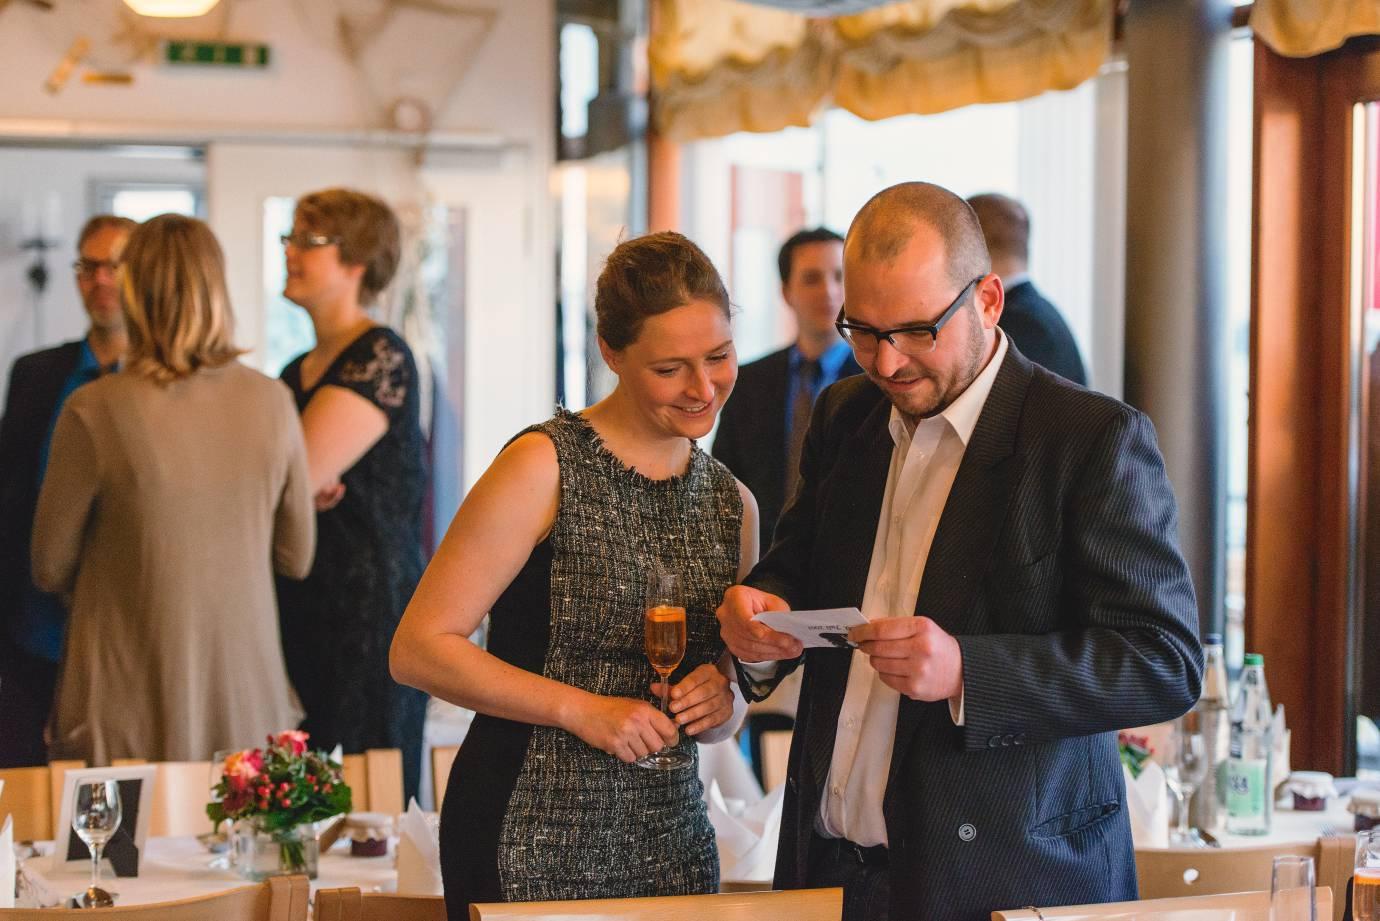 hochzeitsfotograf vegesack 089 - Nadine+Börge